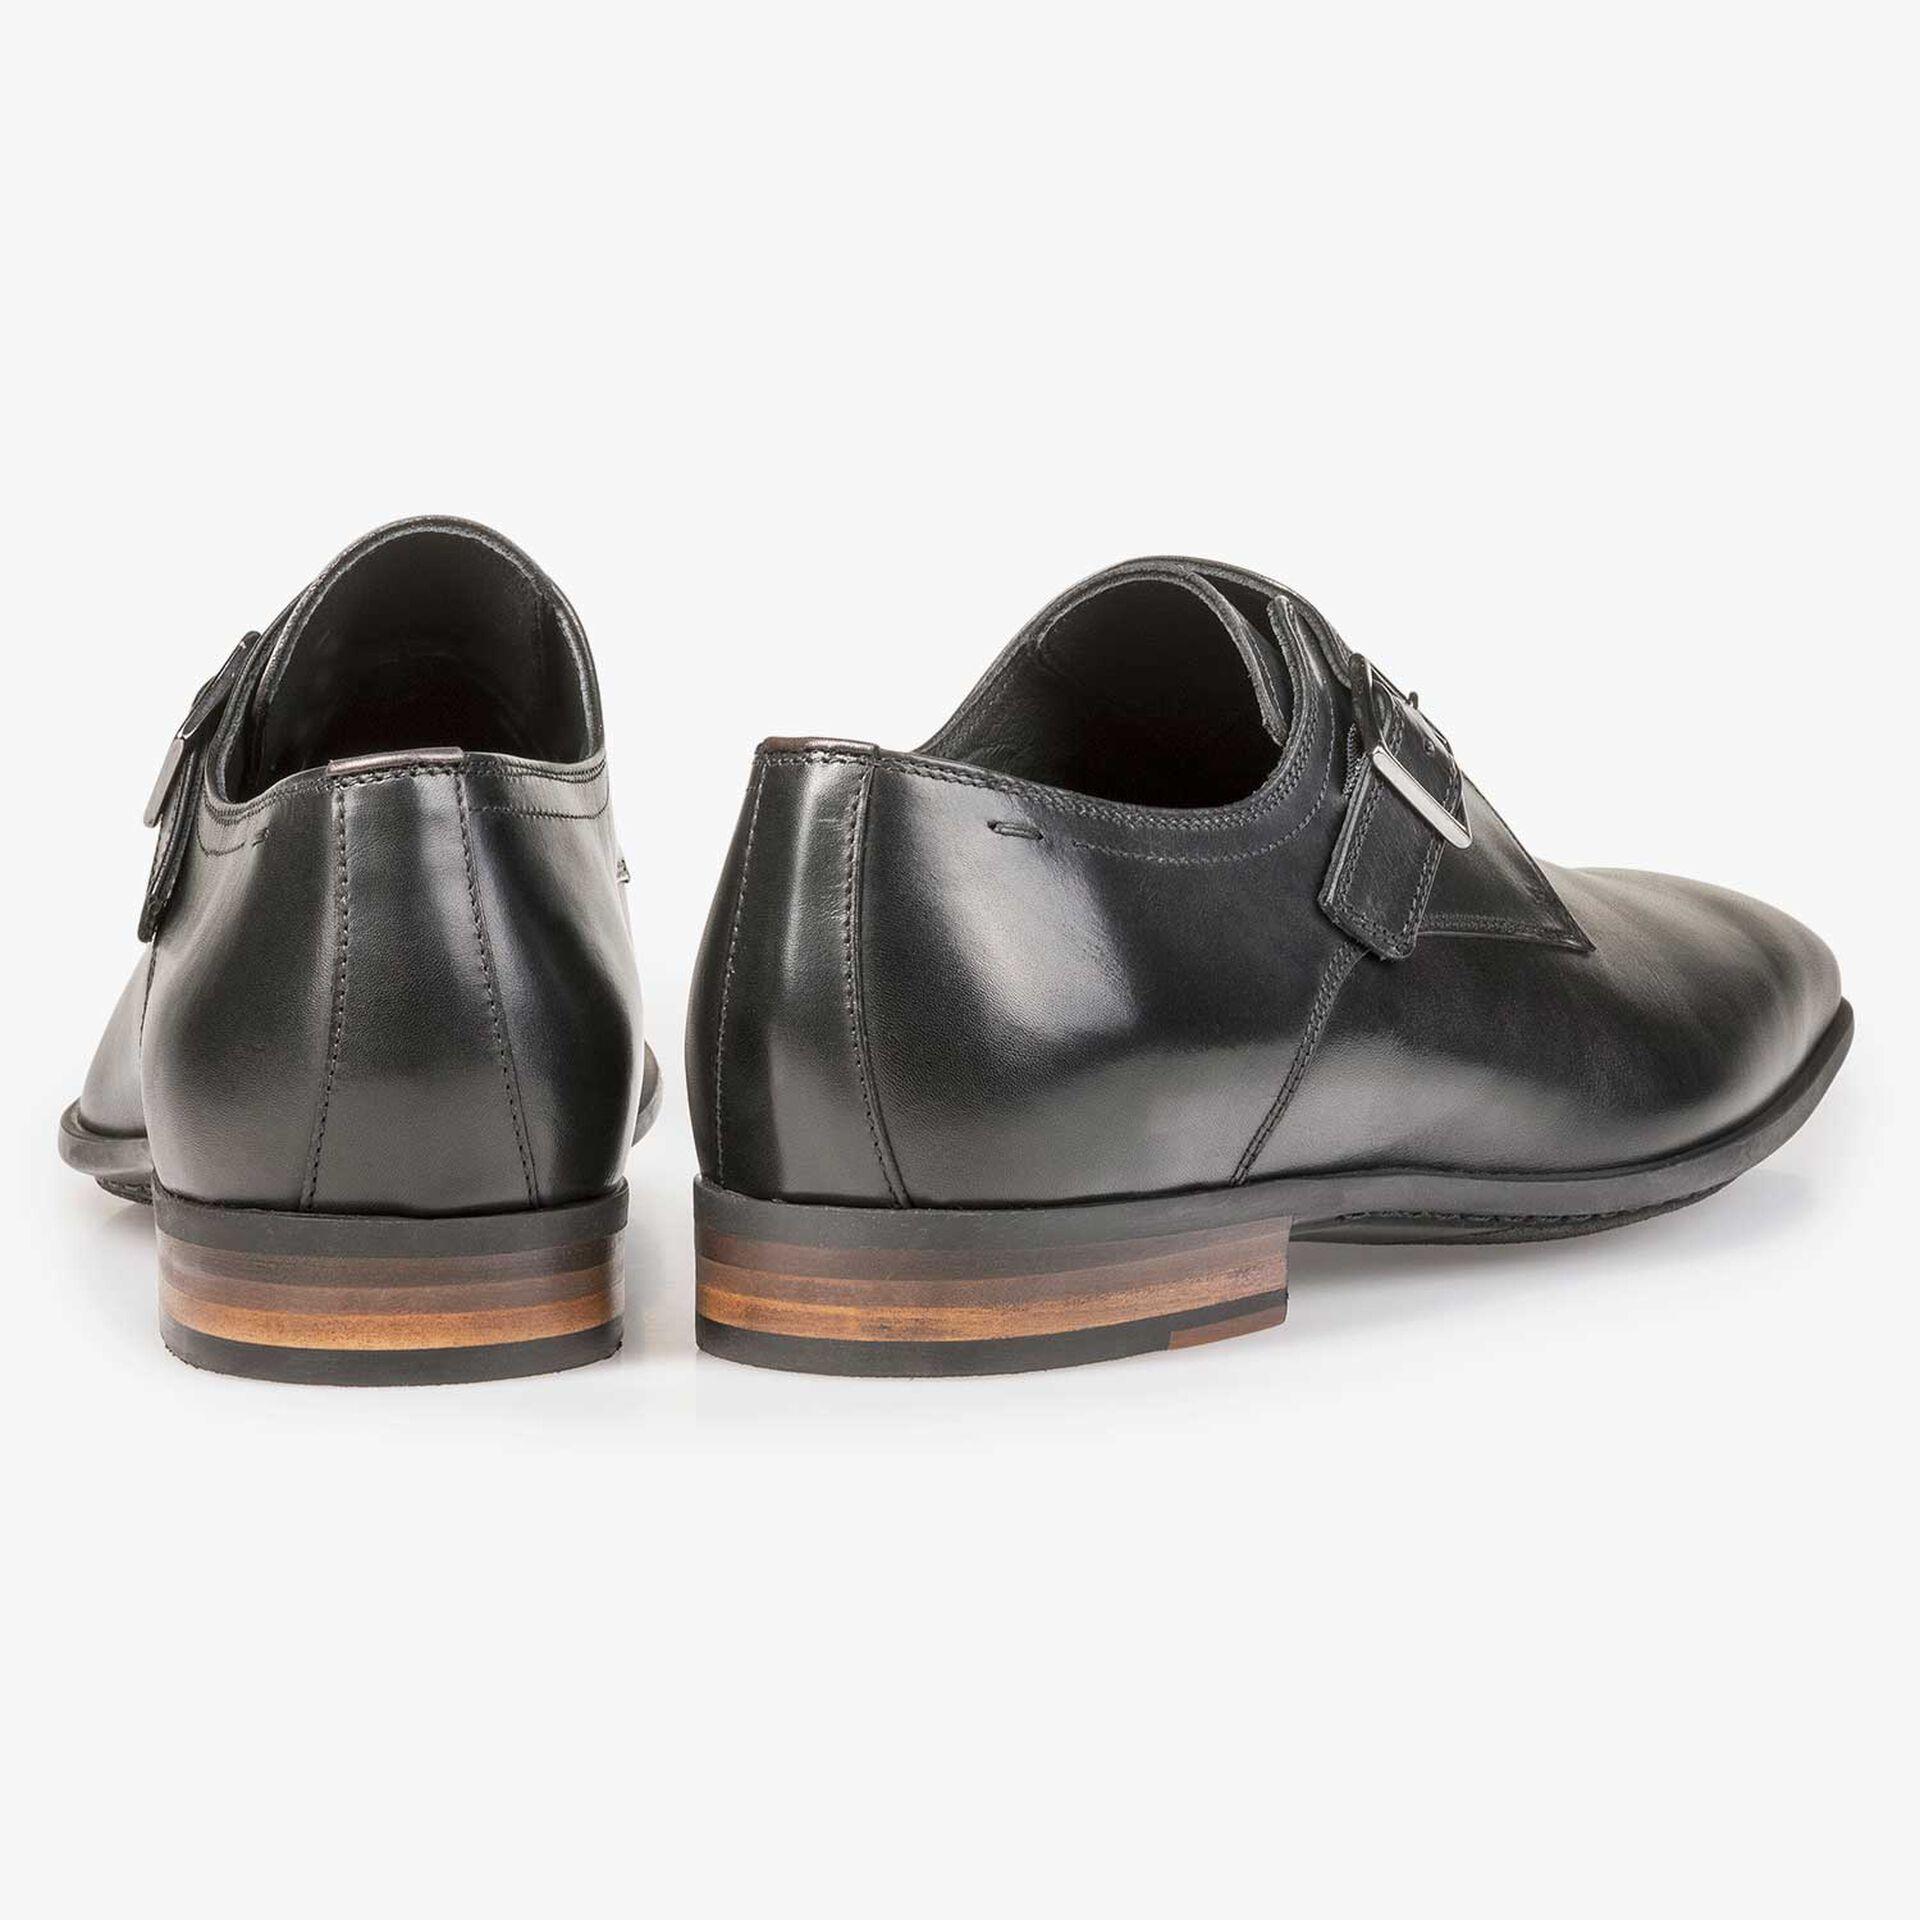 Black calf leather monk strap